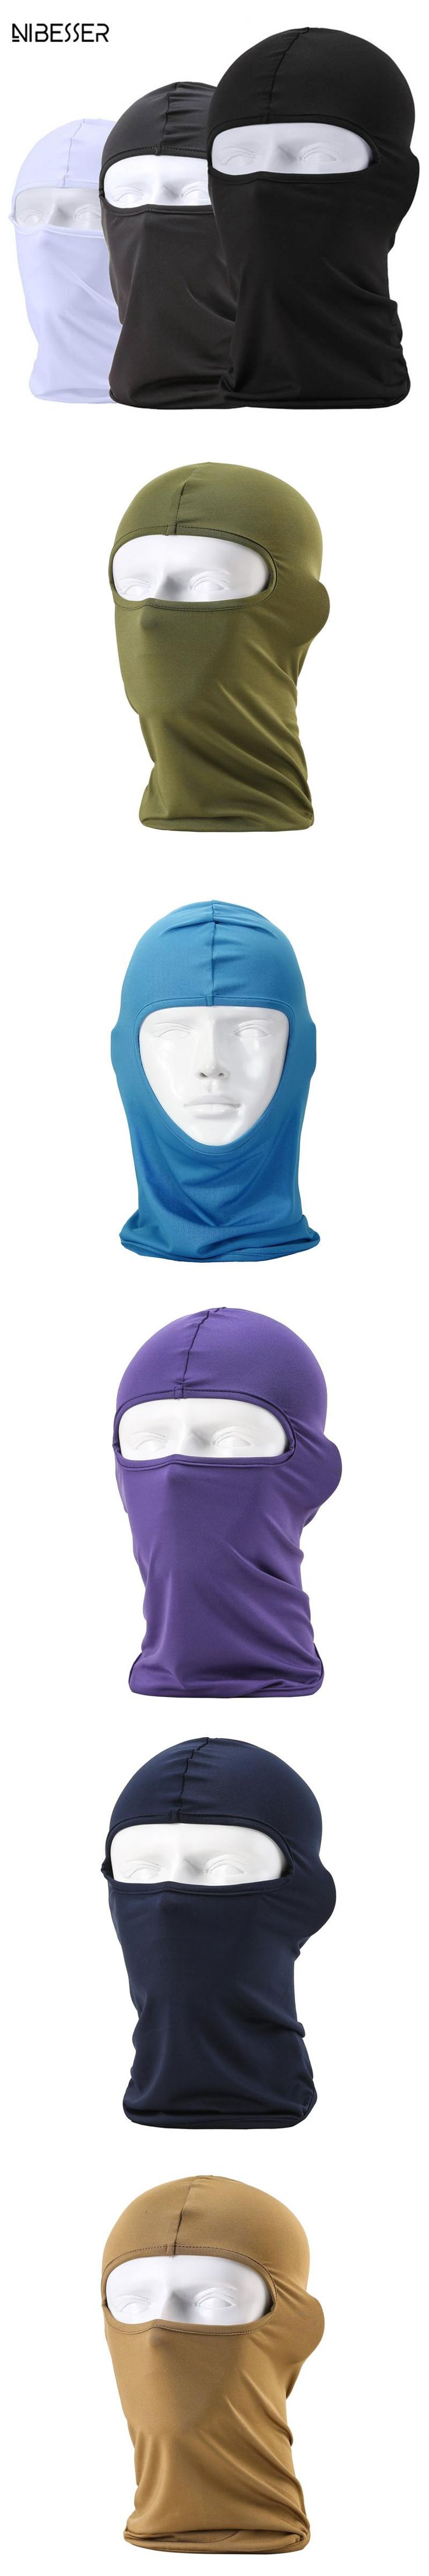 NIBESSER Mask Skullies Men Outdoor Full Face Mask Headwear Protector Lycra Balaclava Masks Motocross Bike Night Protect Mask